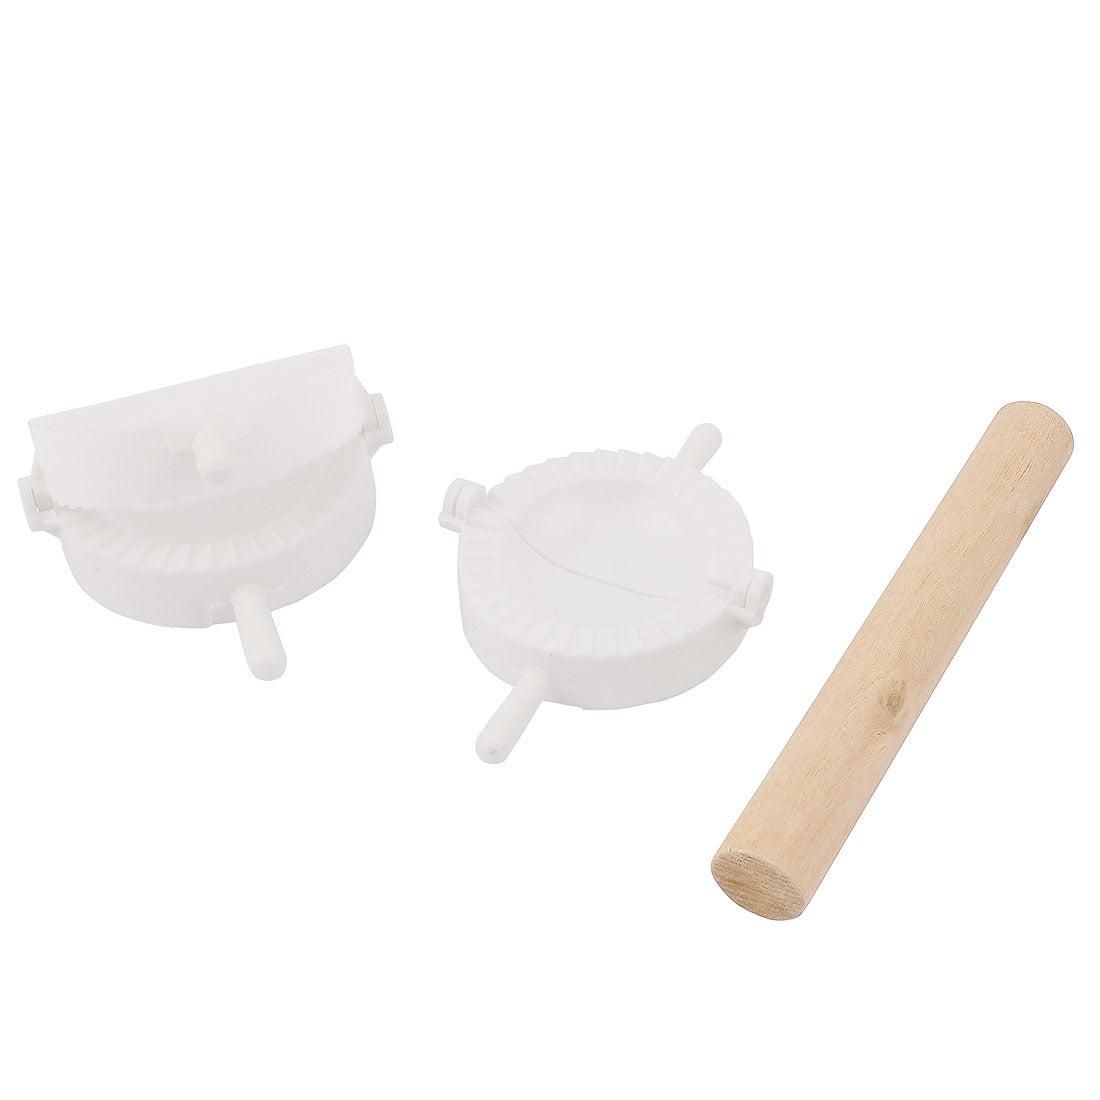 3 in 1 Dumpling Press Mold Ravioli Pierogi DIY Maker Rolling Pin Set by